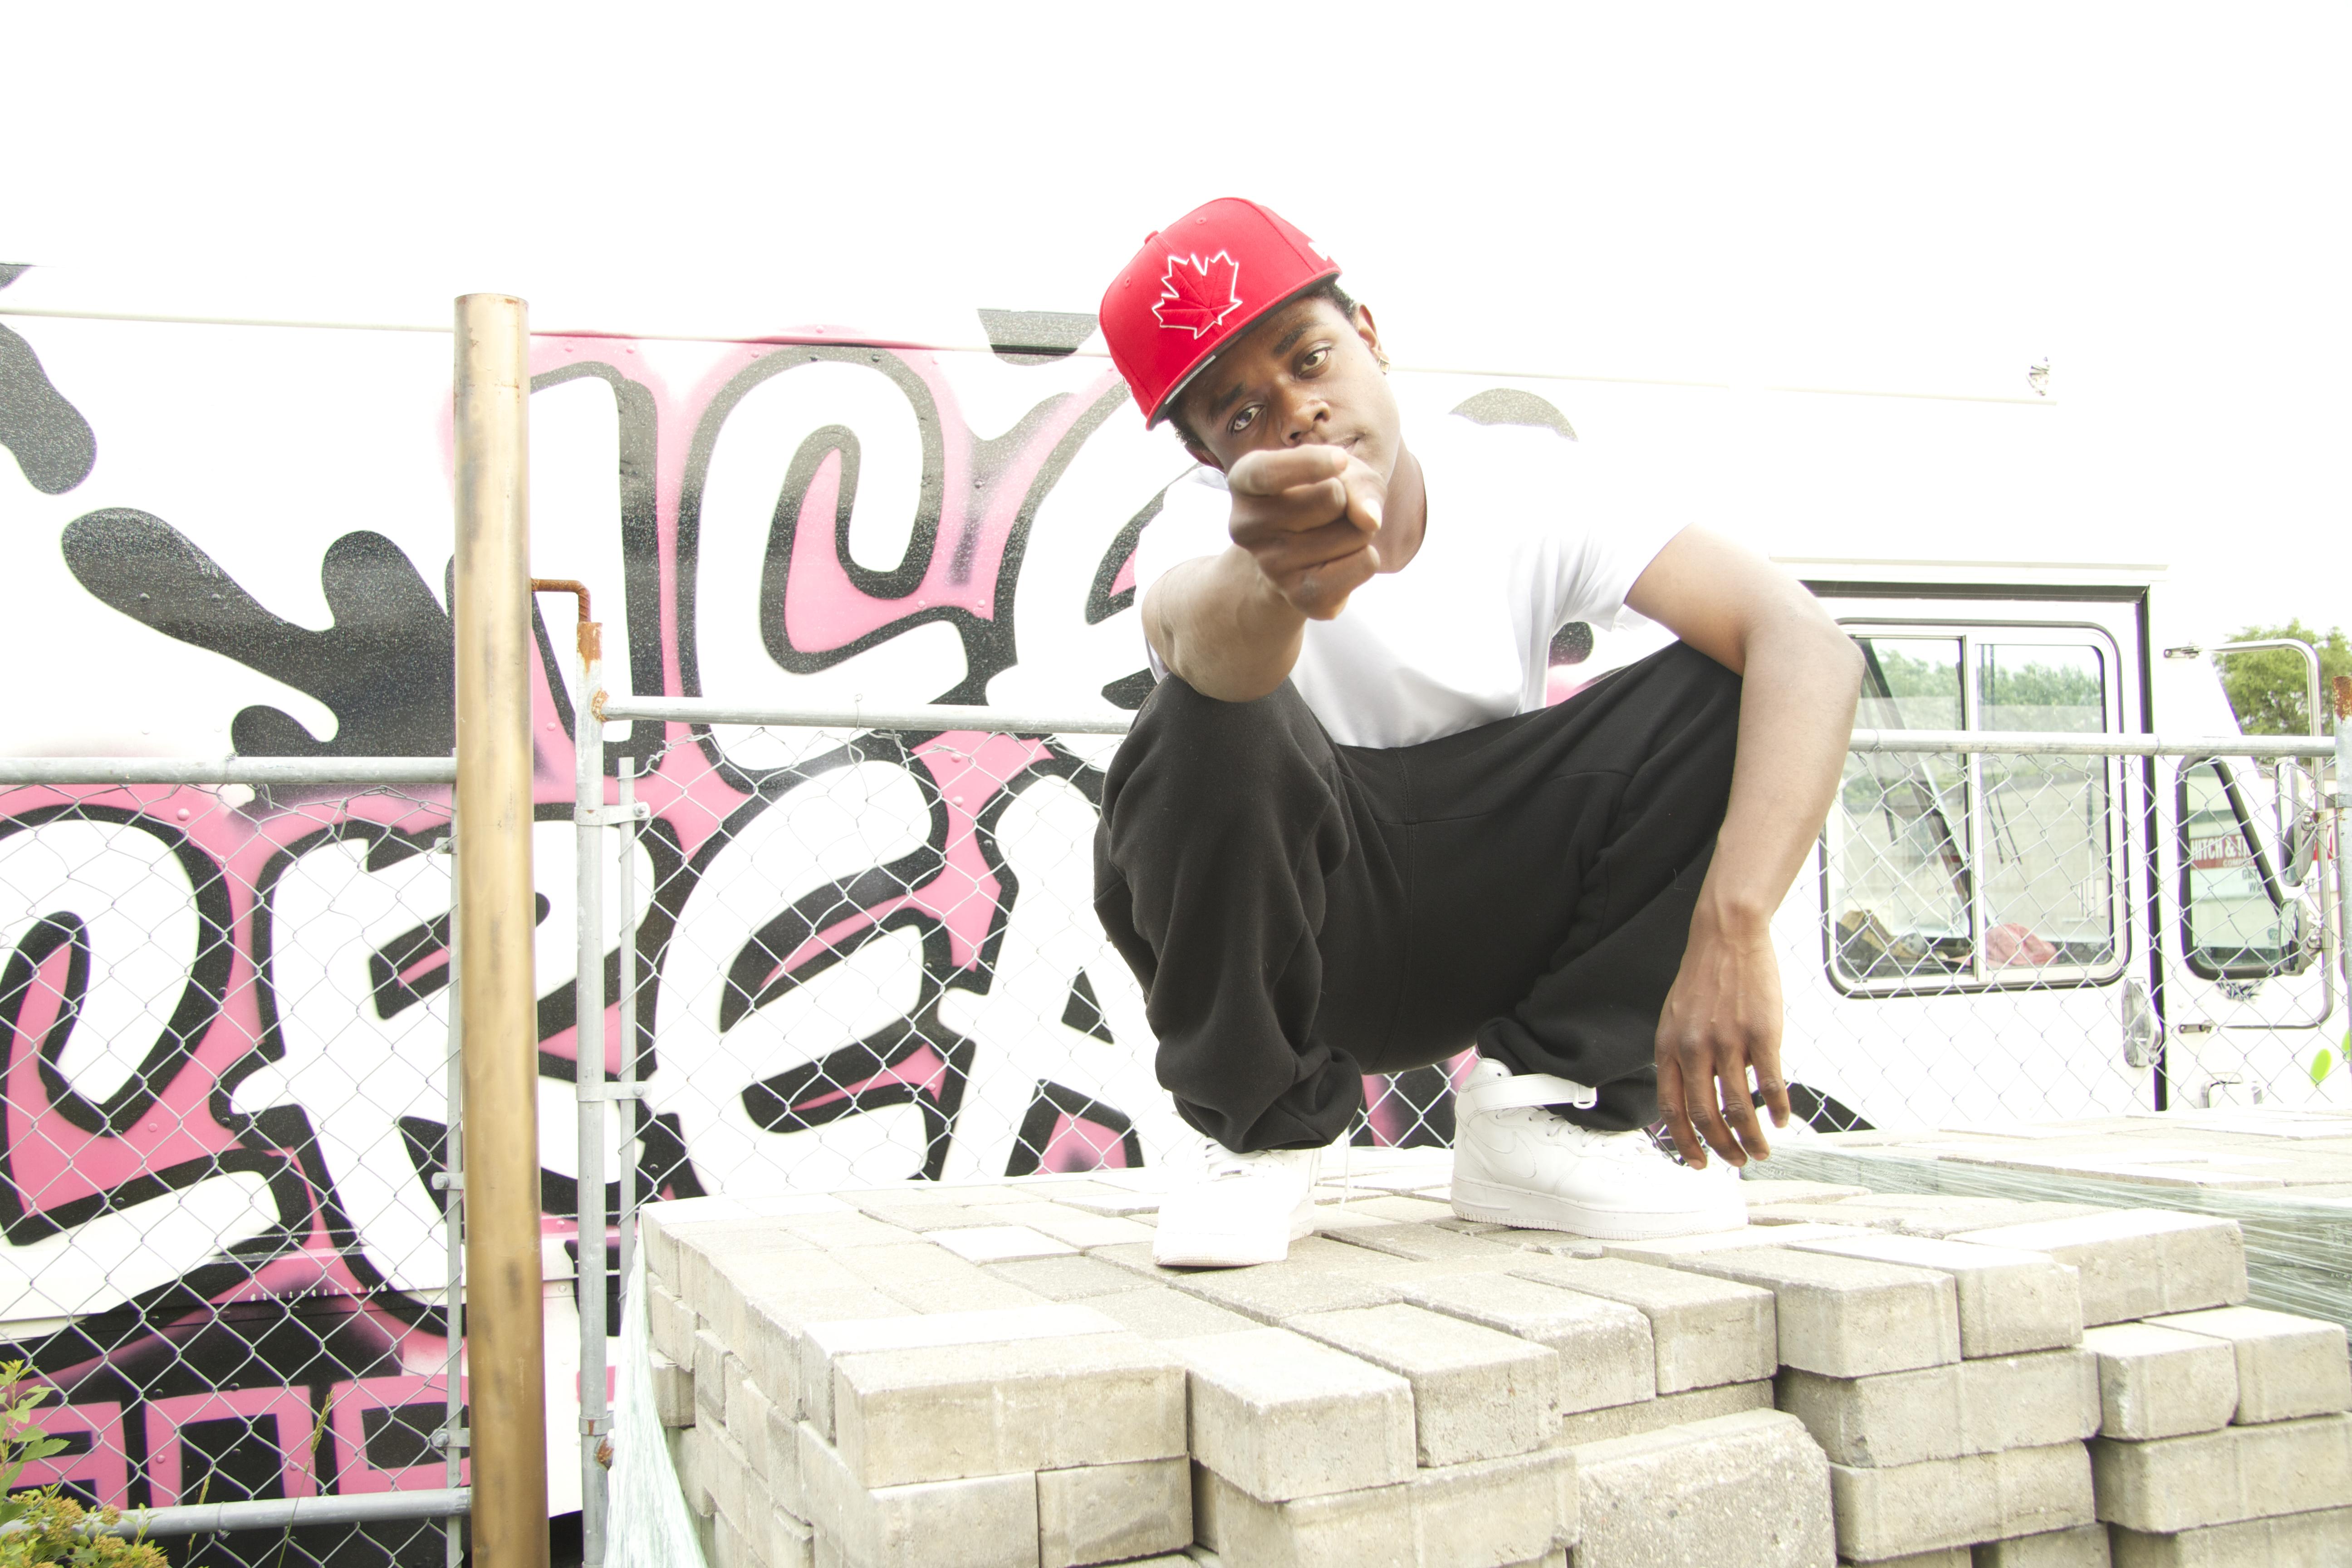 Meet Toronto's Roney, Toronto's Gangster Rap Wunderkind - VICE